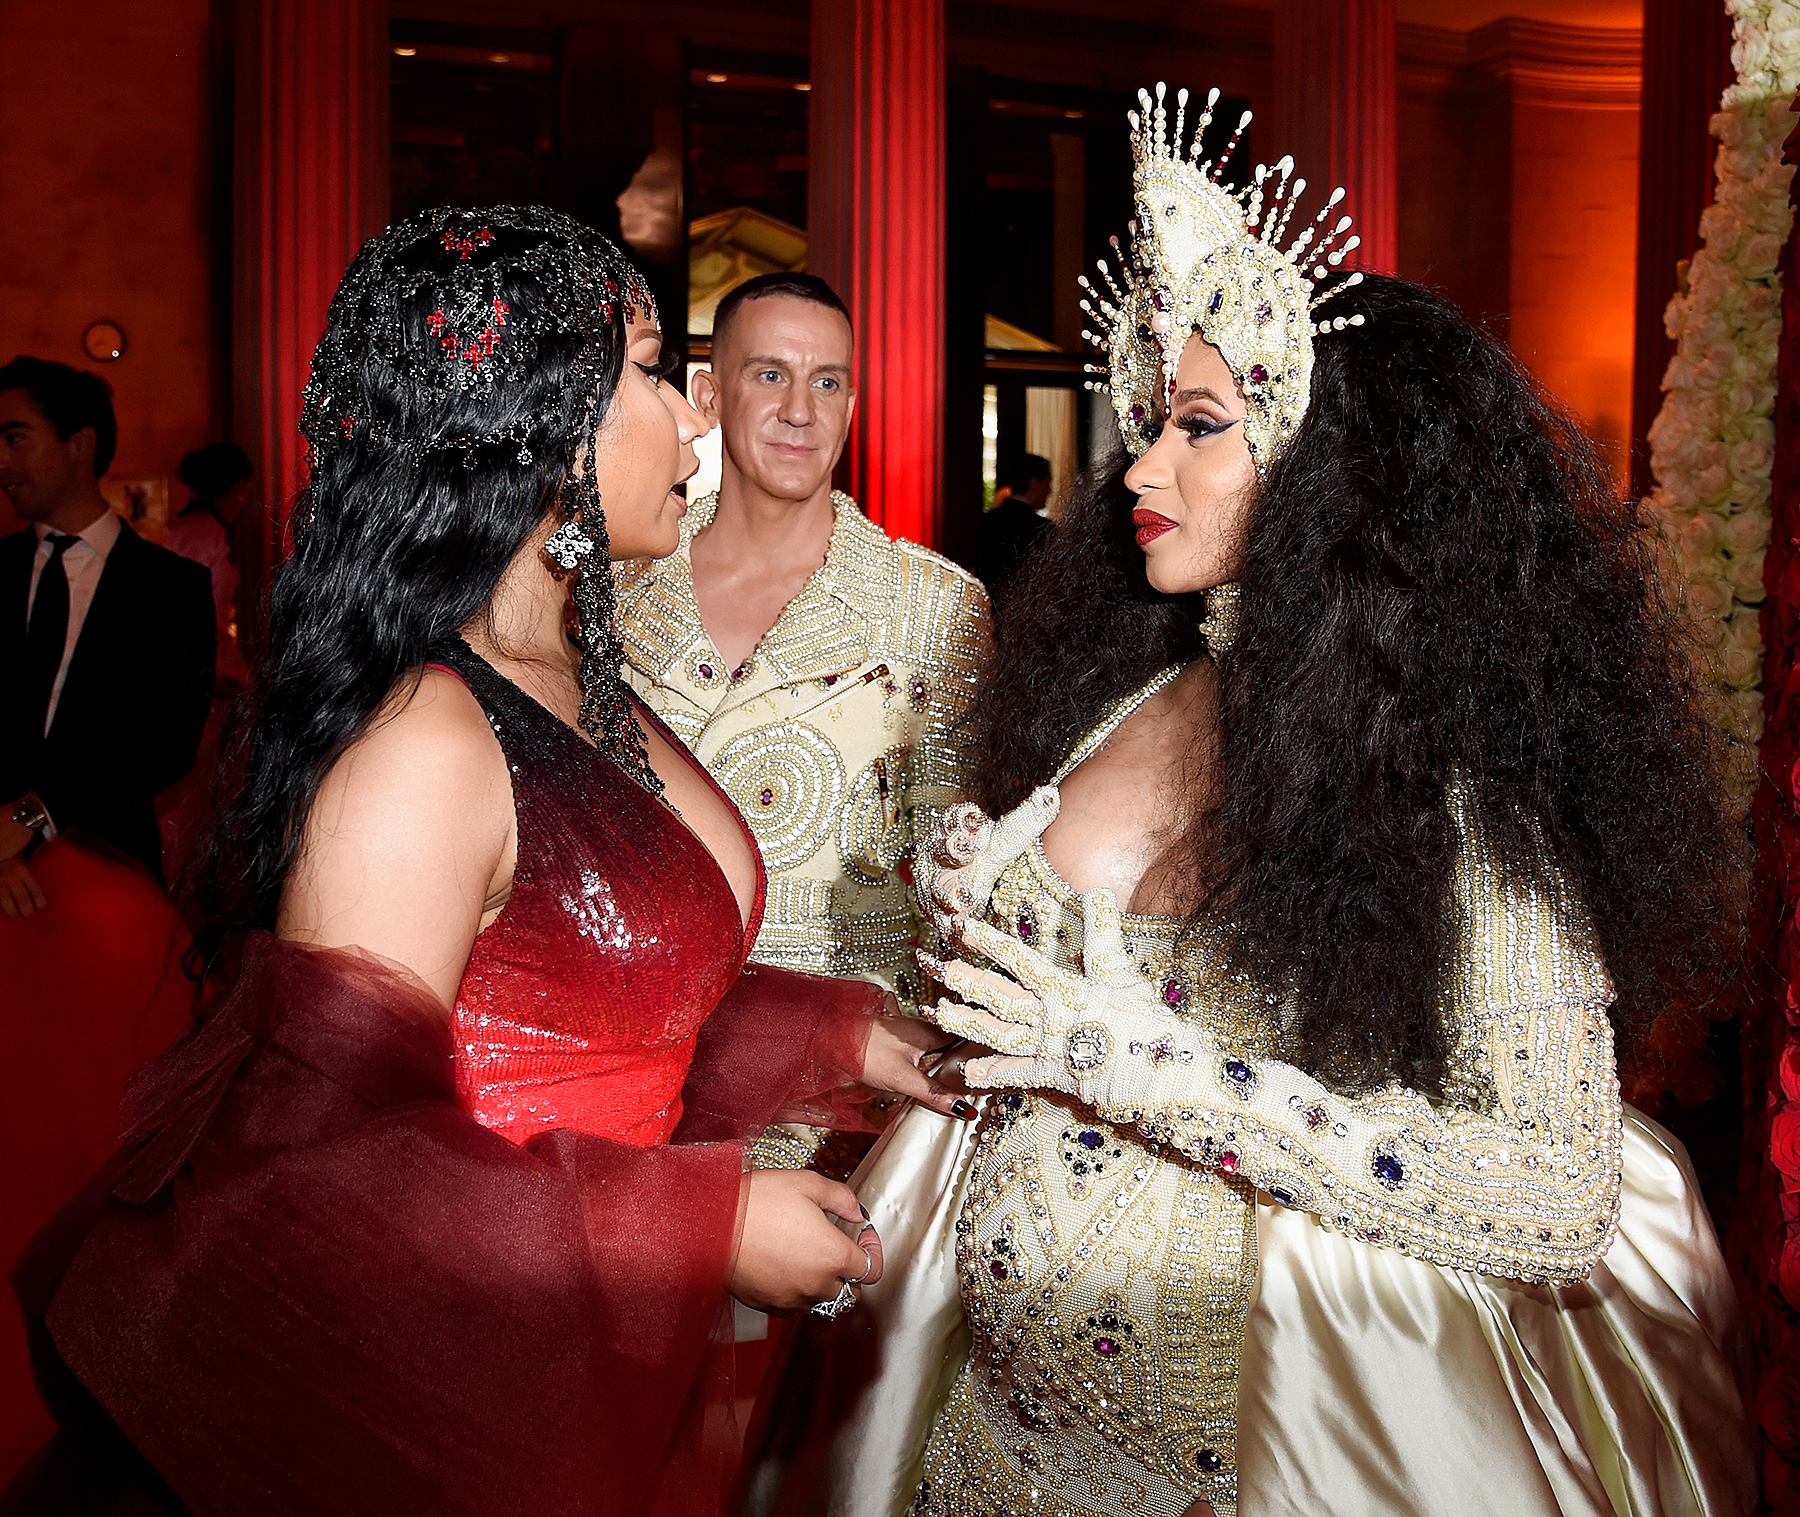 b79c21dee1a7 Everything We Know About Nicki Minaj and Cardi B's Long-Running Feud